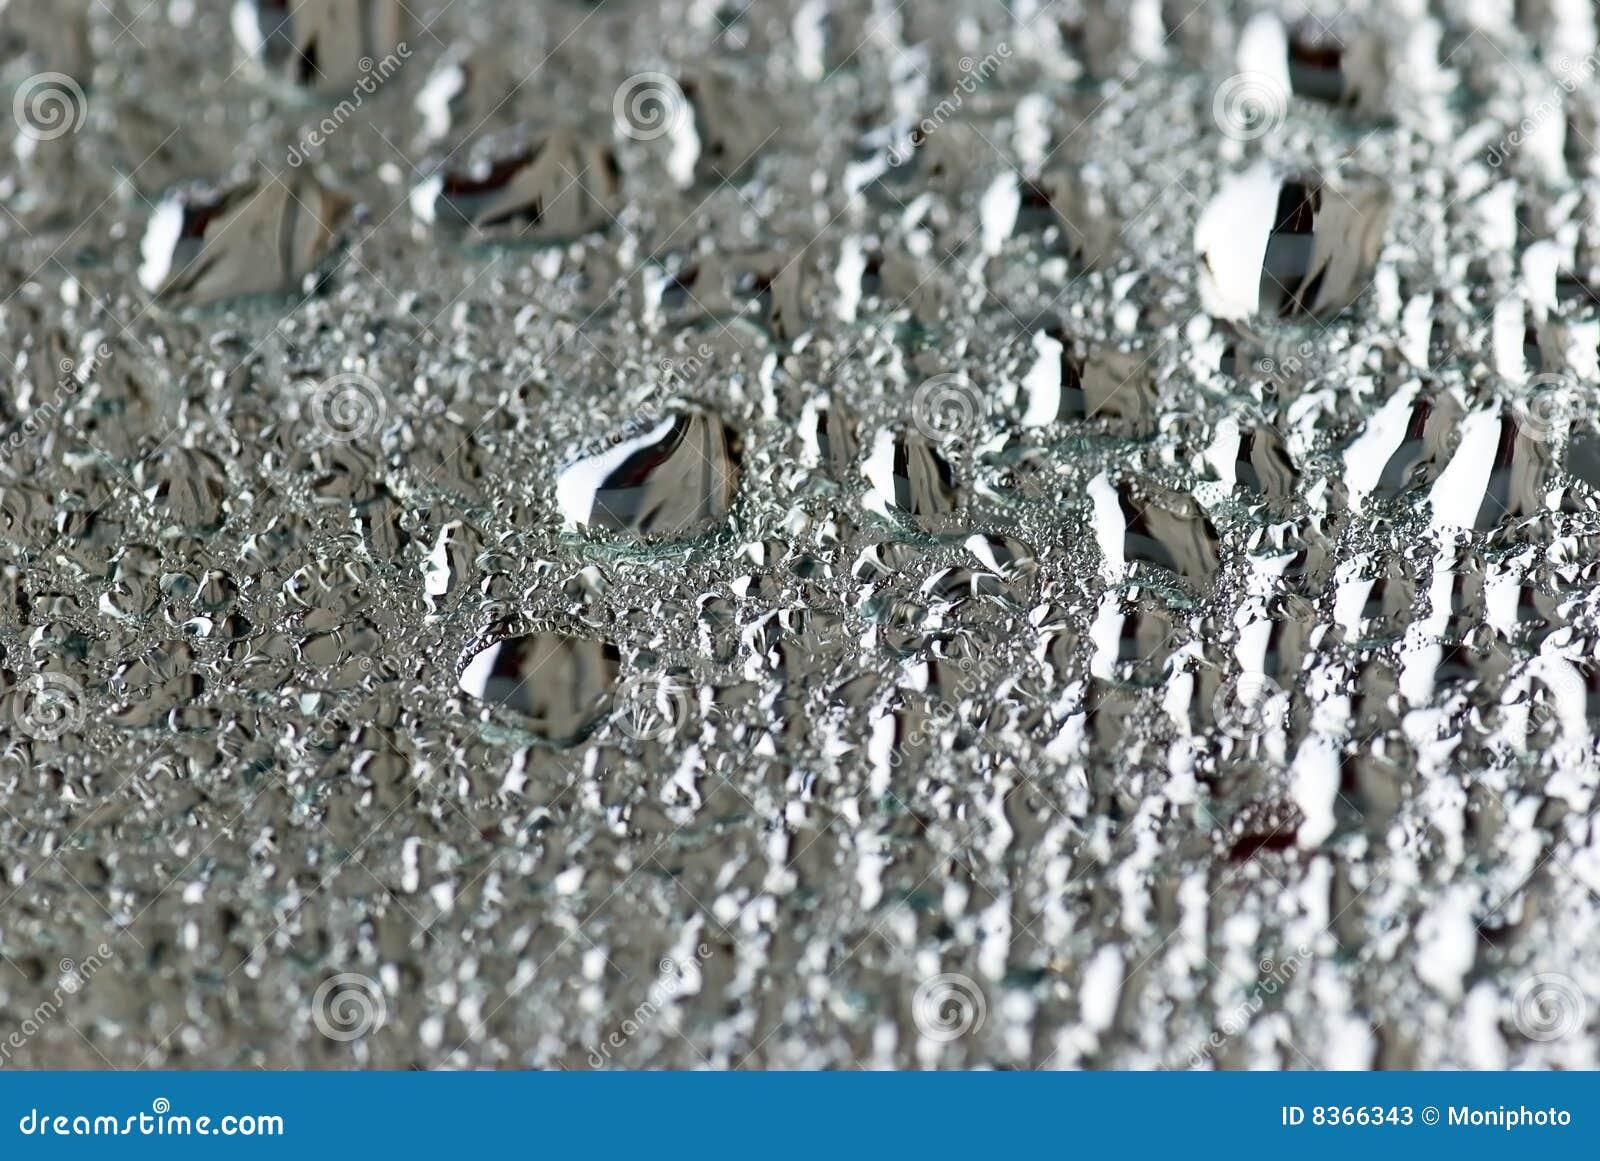 Fondo metálico de plata aplicado con brocha con BU plateados